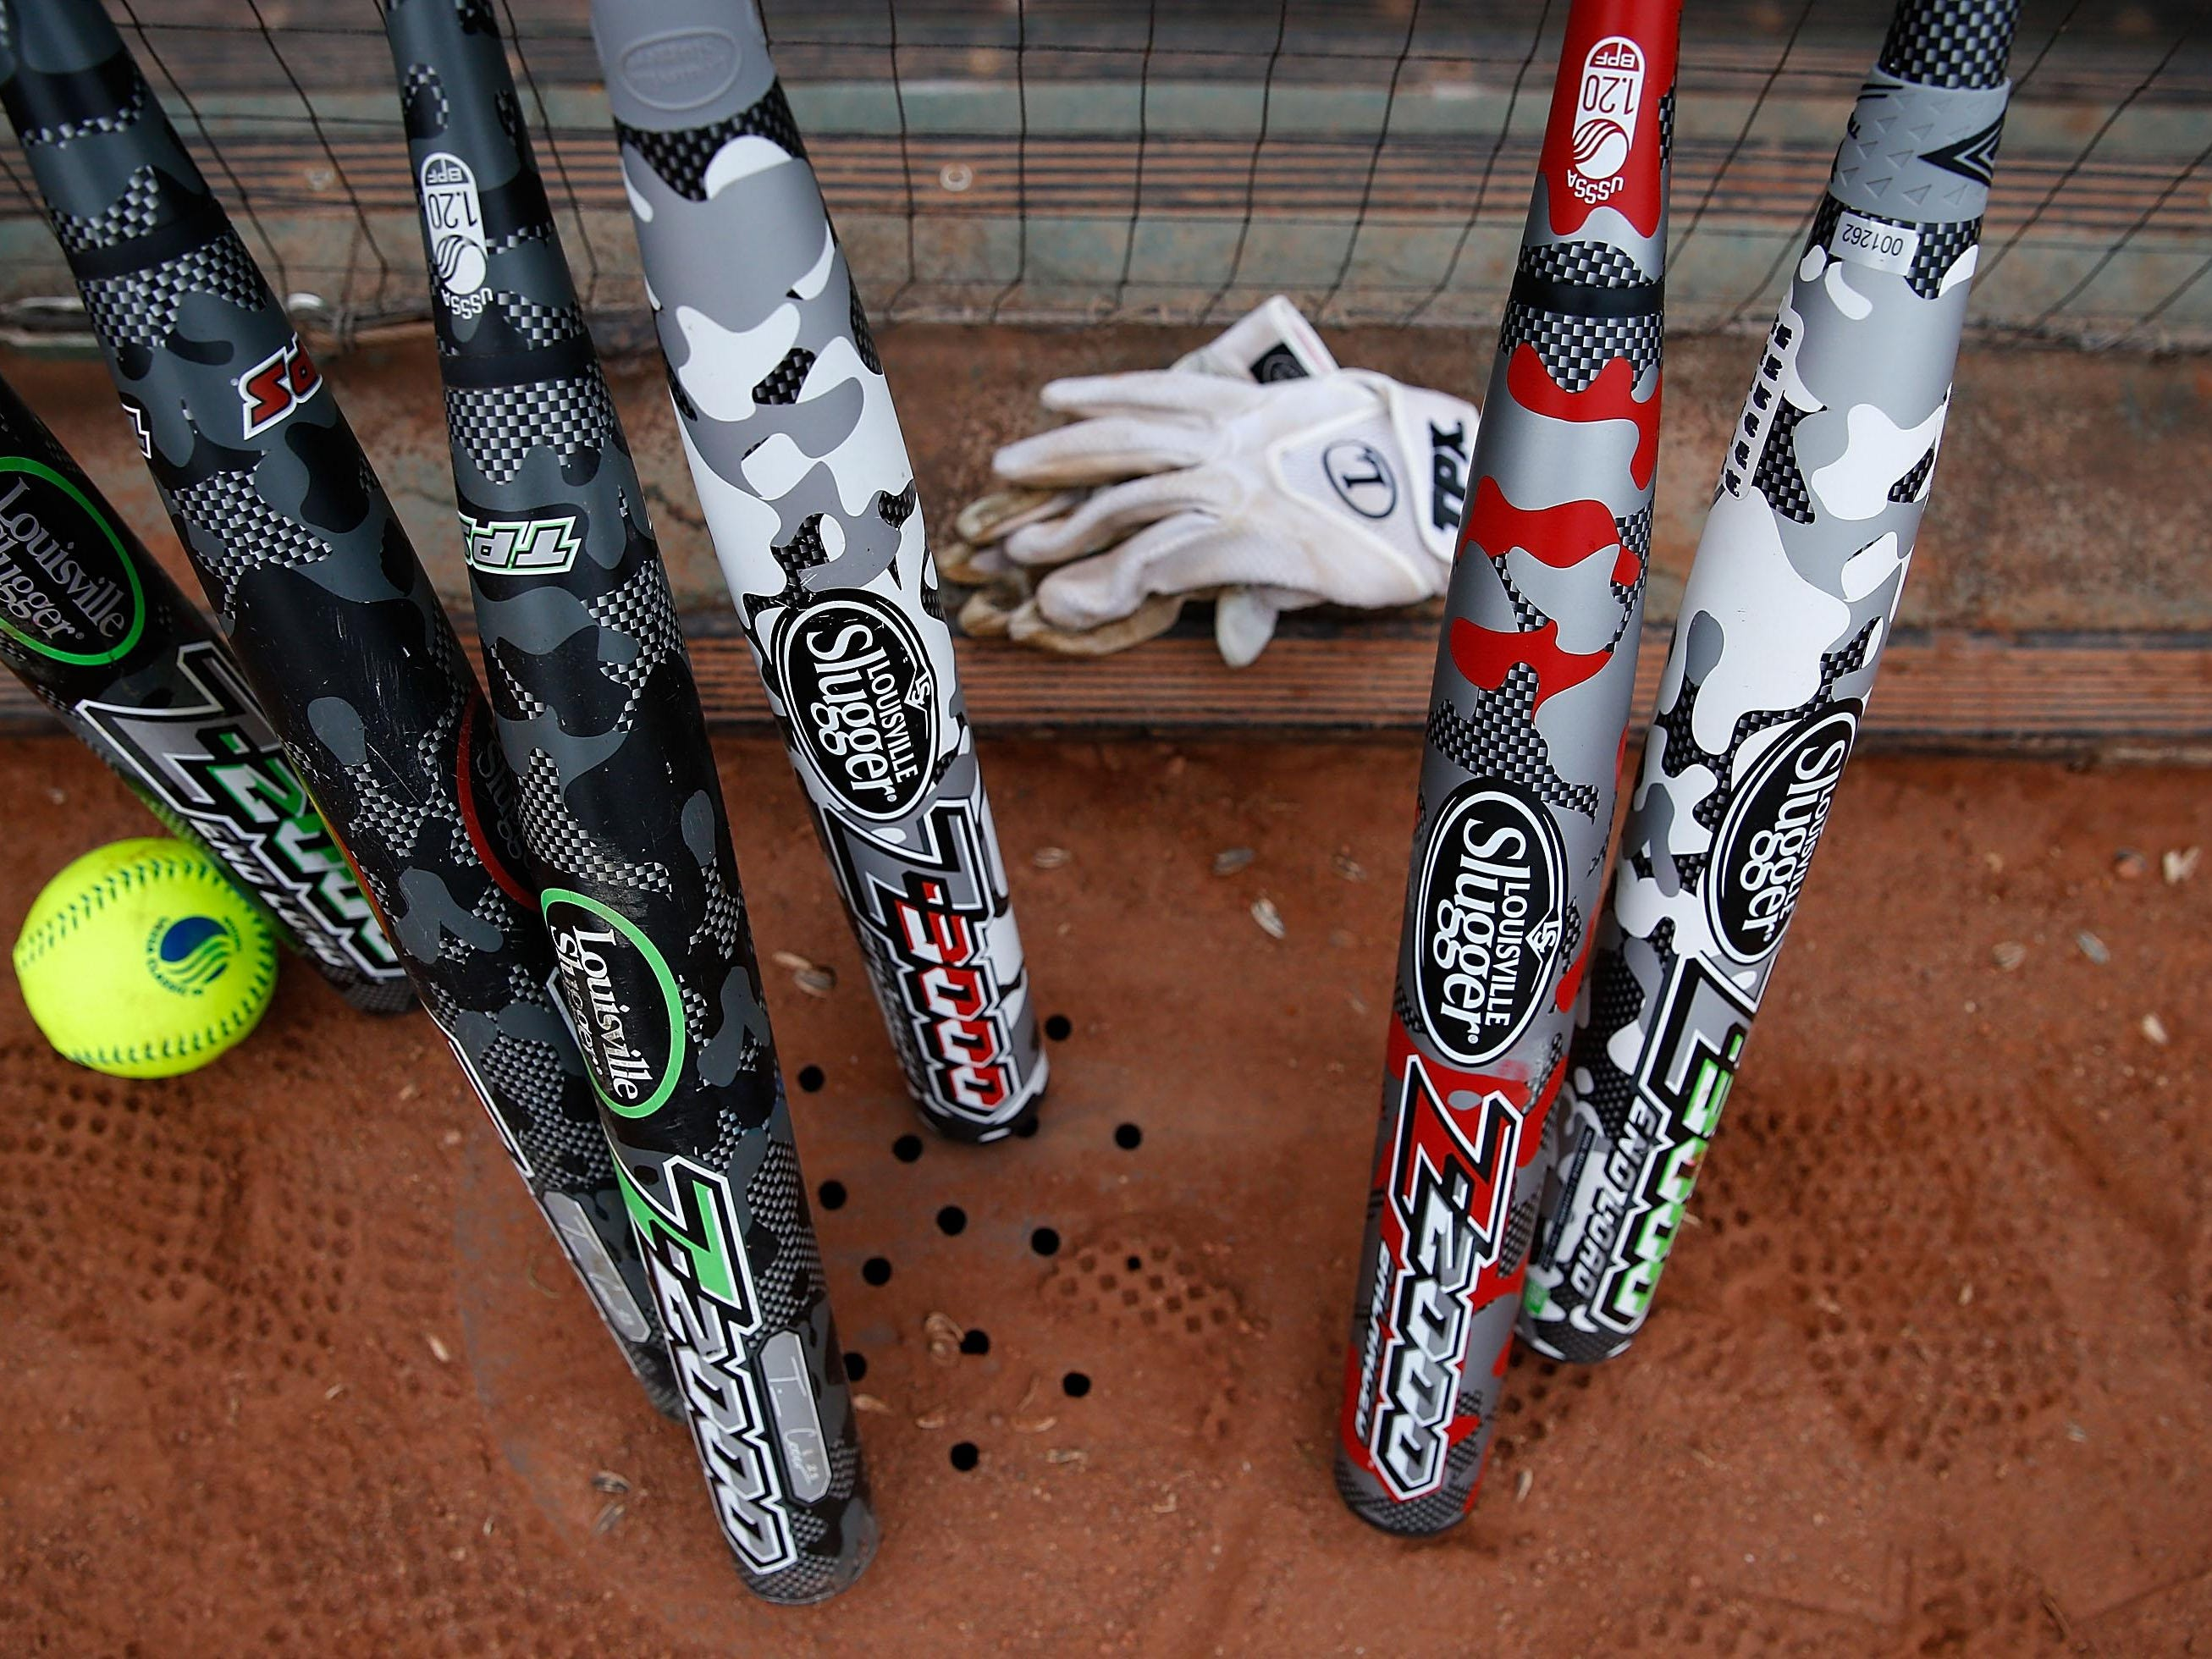 Baseball and softball games on the Space Coast.